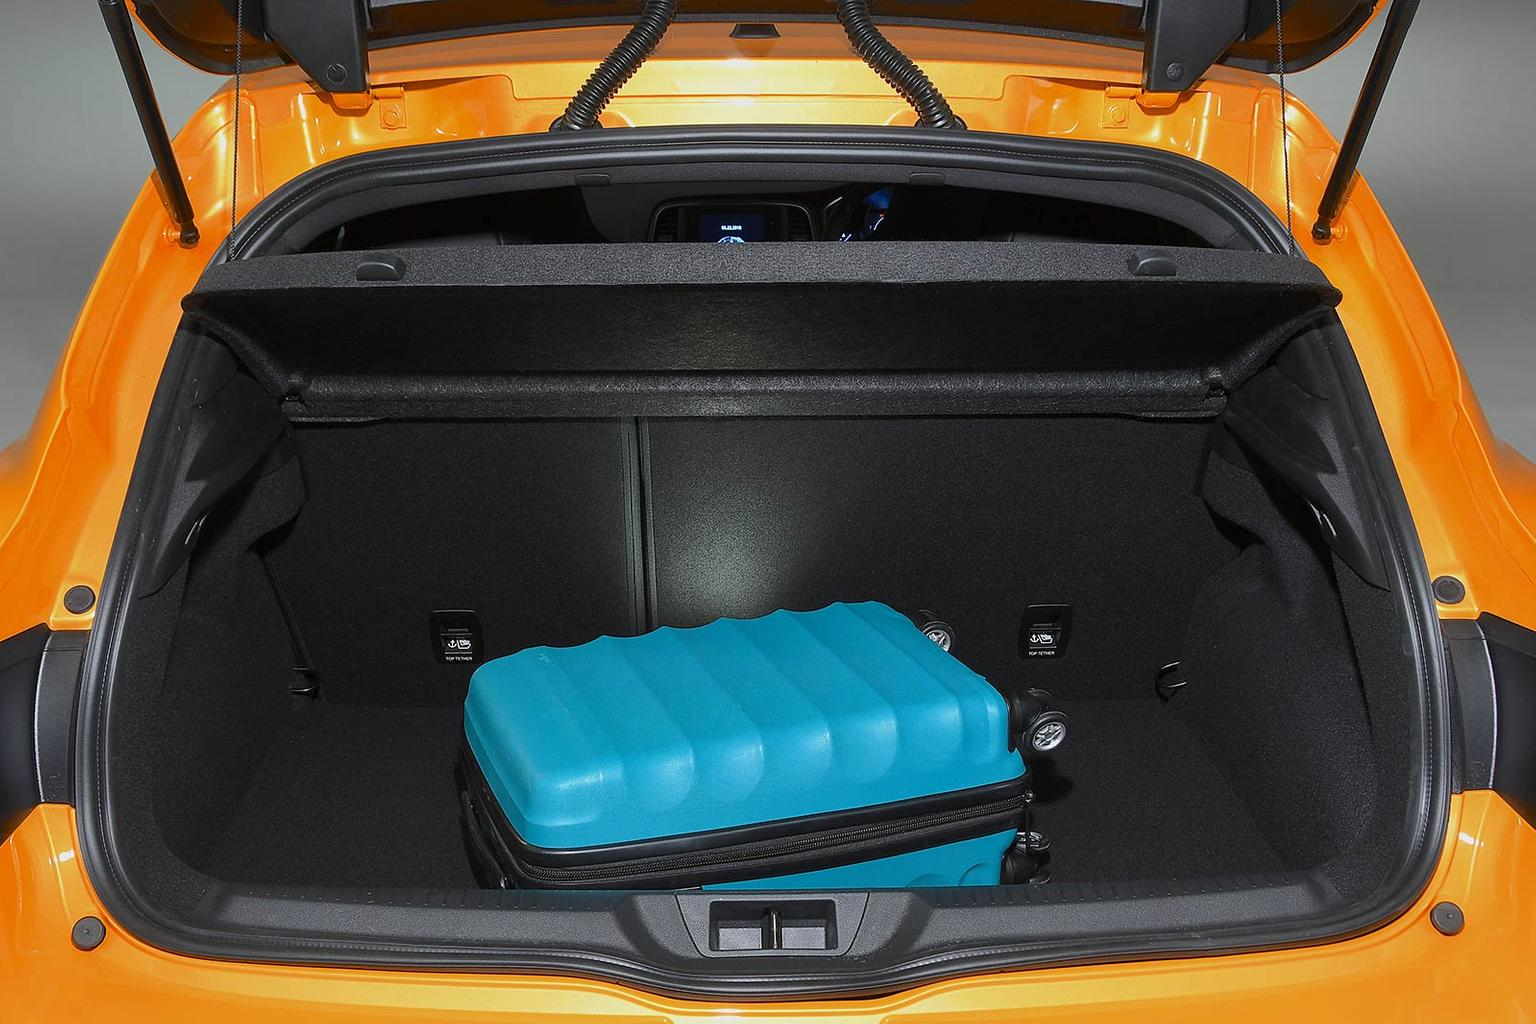 New Renault Megane RS vs Honda Civic Type R vs Volkswagen Golf R